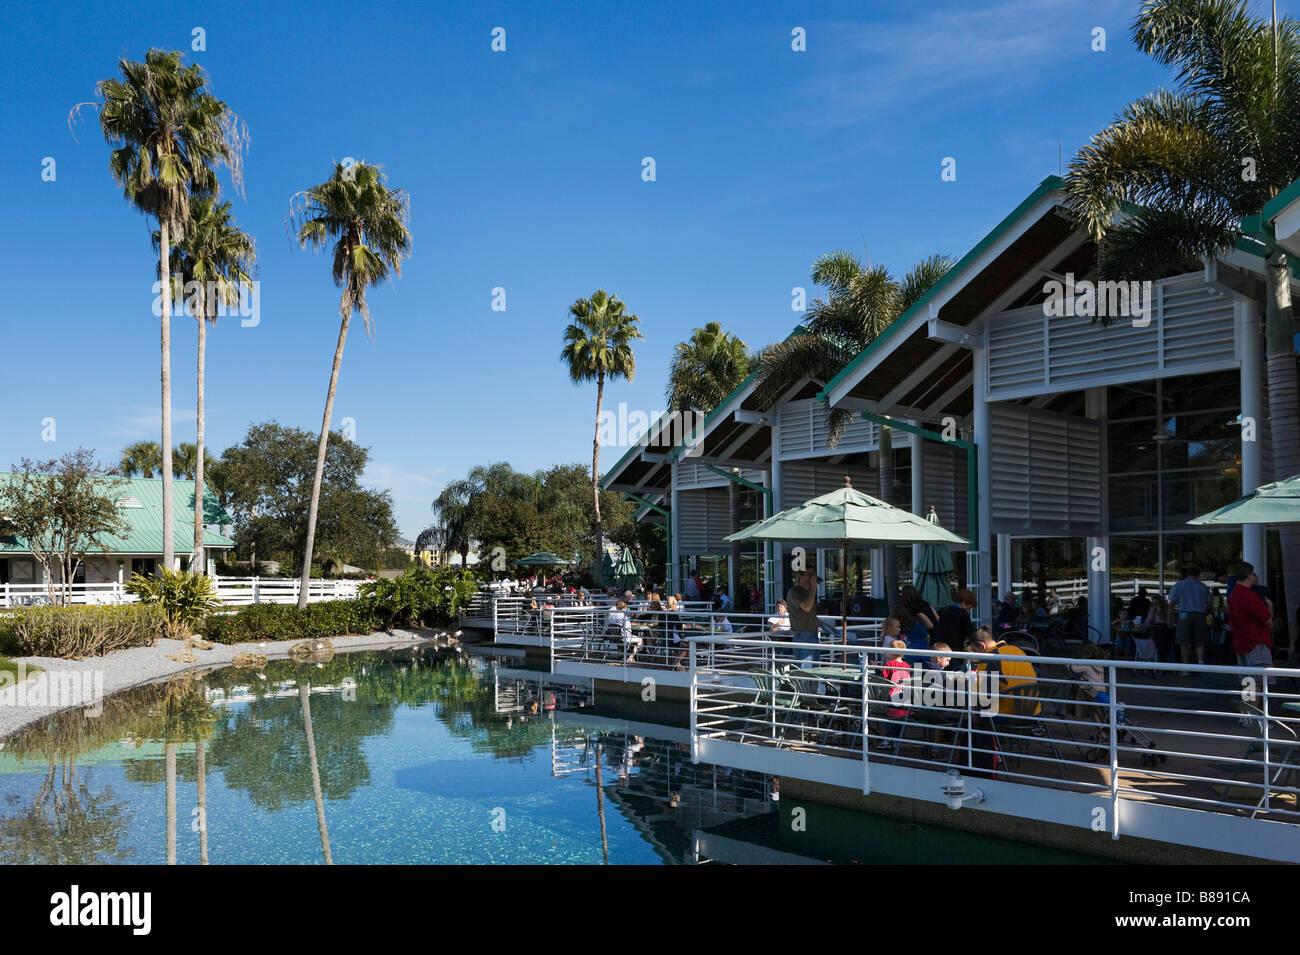 Anheuser Busch Hospitality Center, Sea World, Orlando, Central Florida, USA - Stock Image